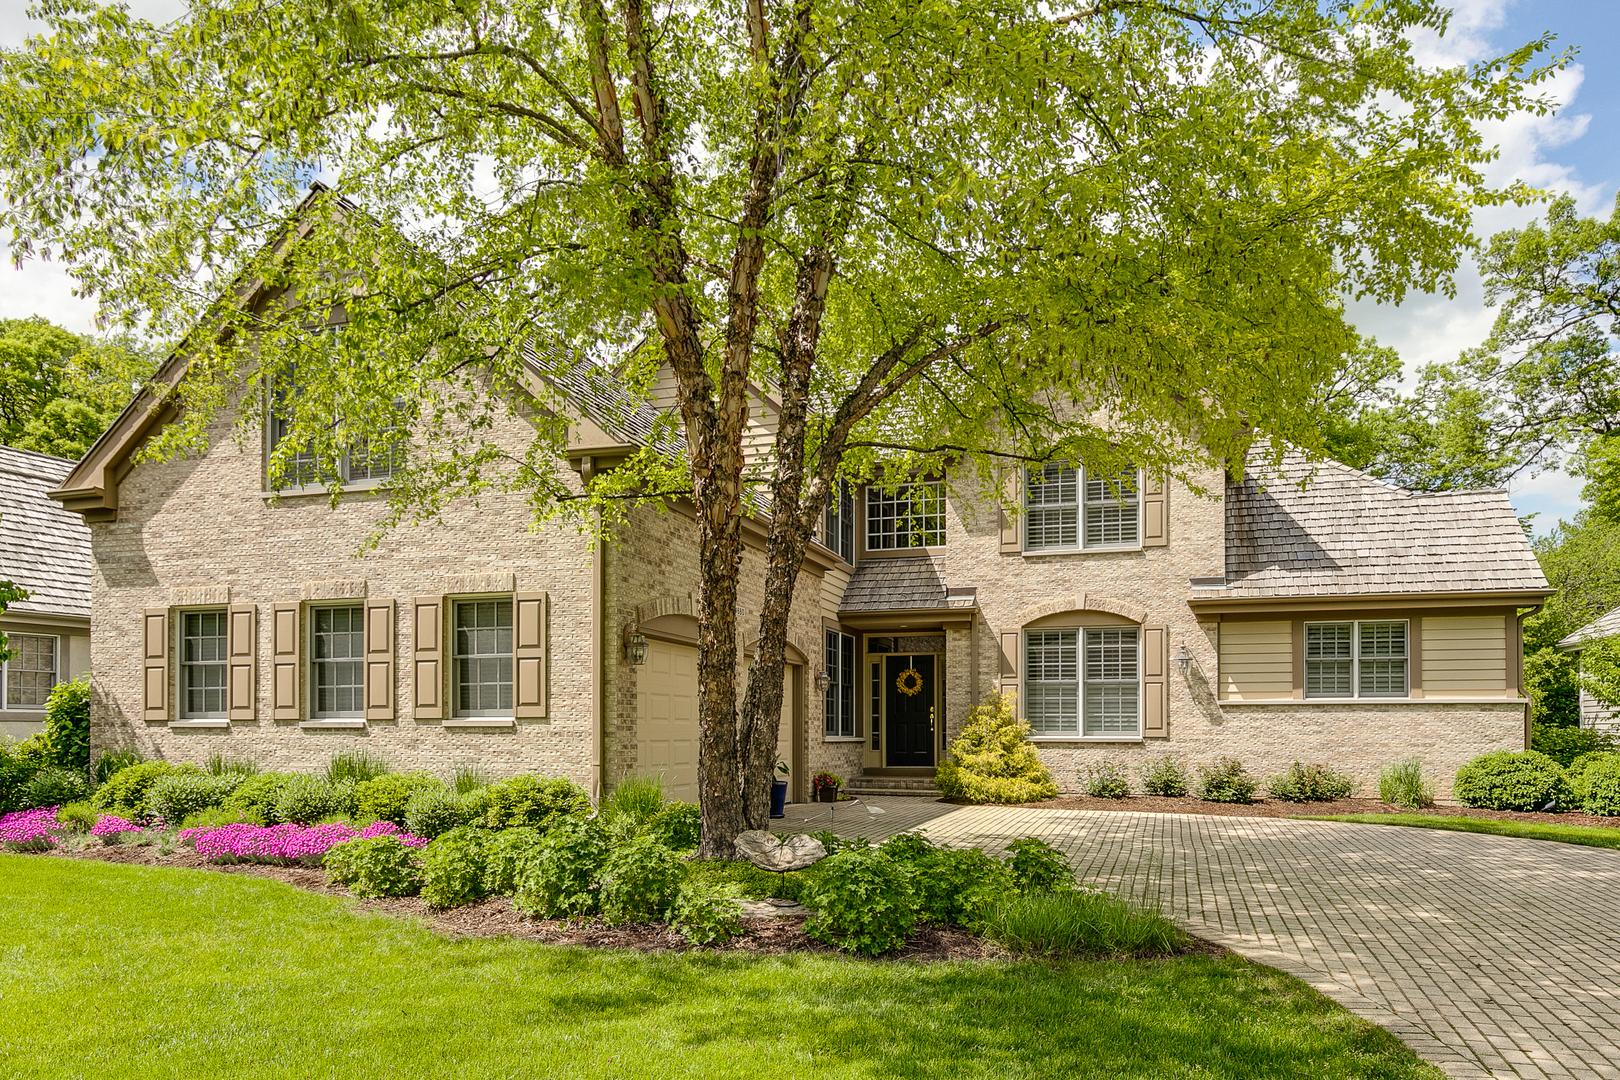 1680 Cornell, Lake Forest, Illinois, 60045